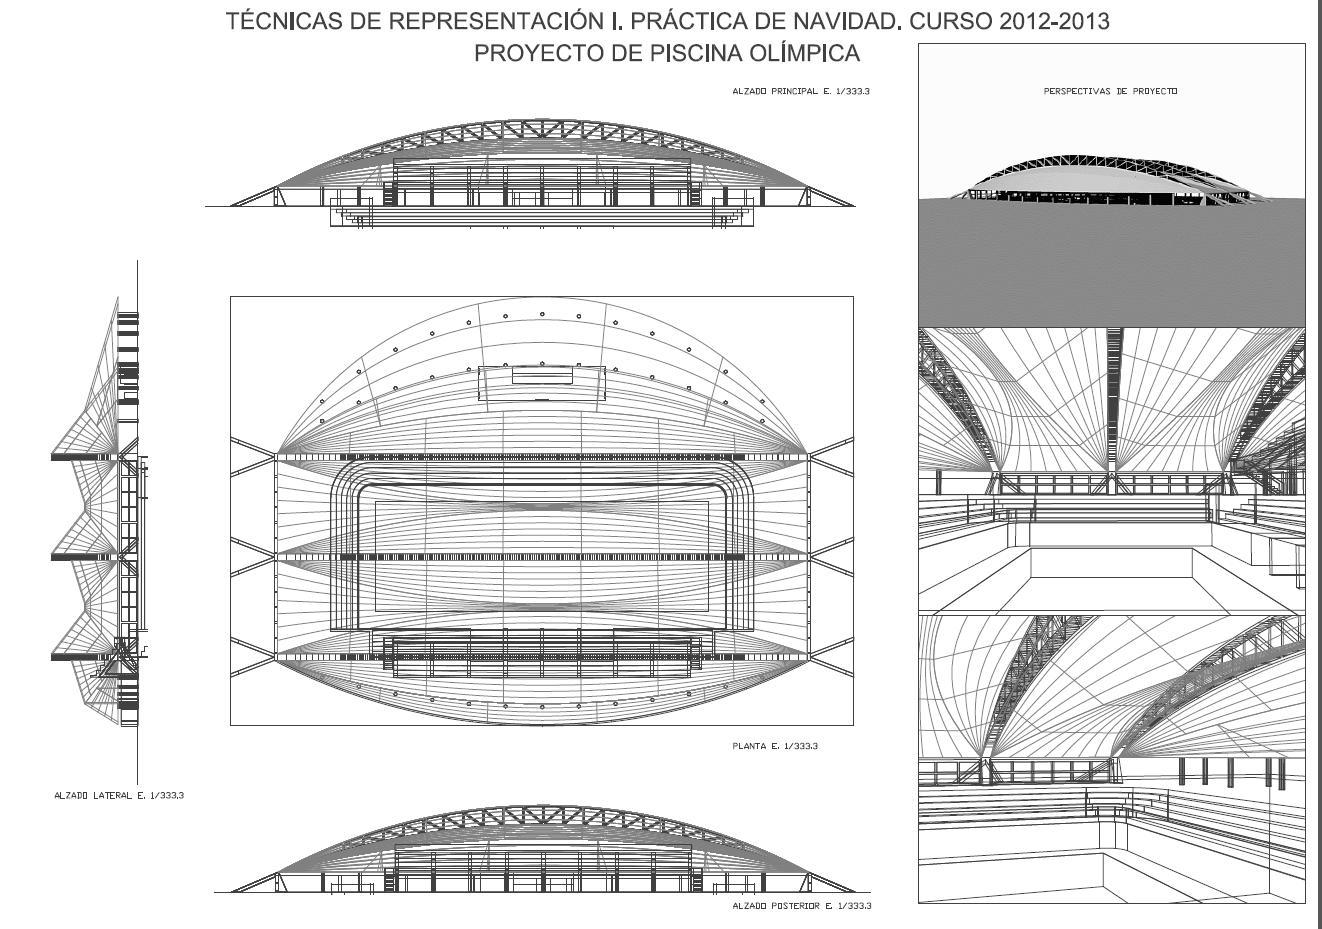 Eines inform tiques ii y eines informatiques i piscina for Diseno grafico de piscina olimpica